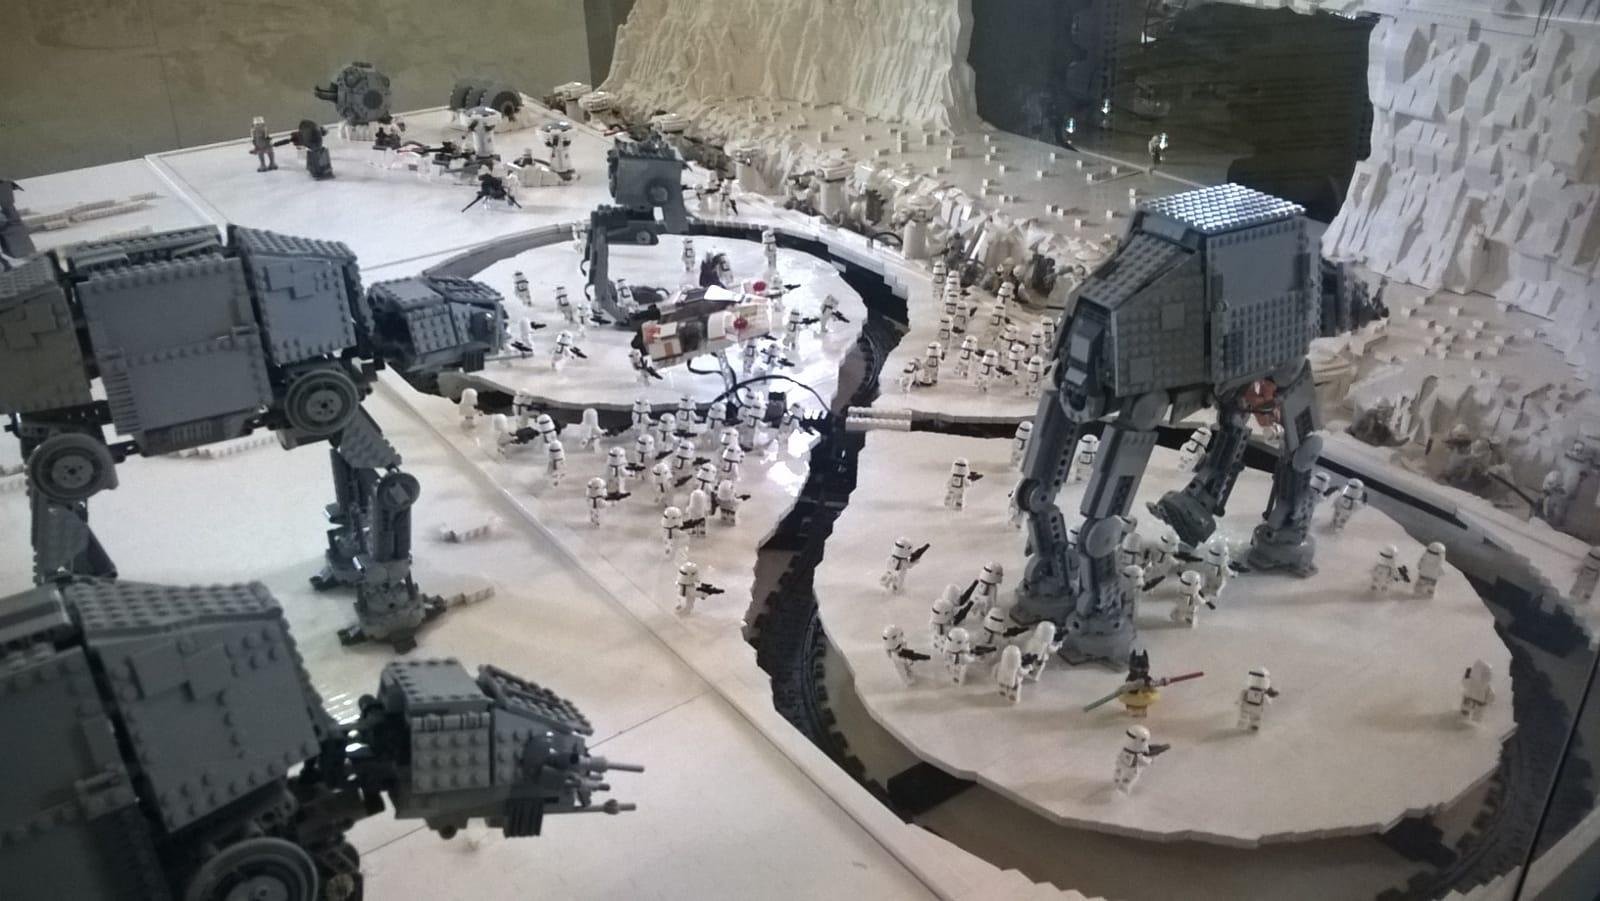 battaglia di hoth lego mostra star wars